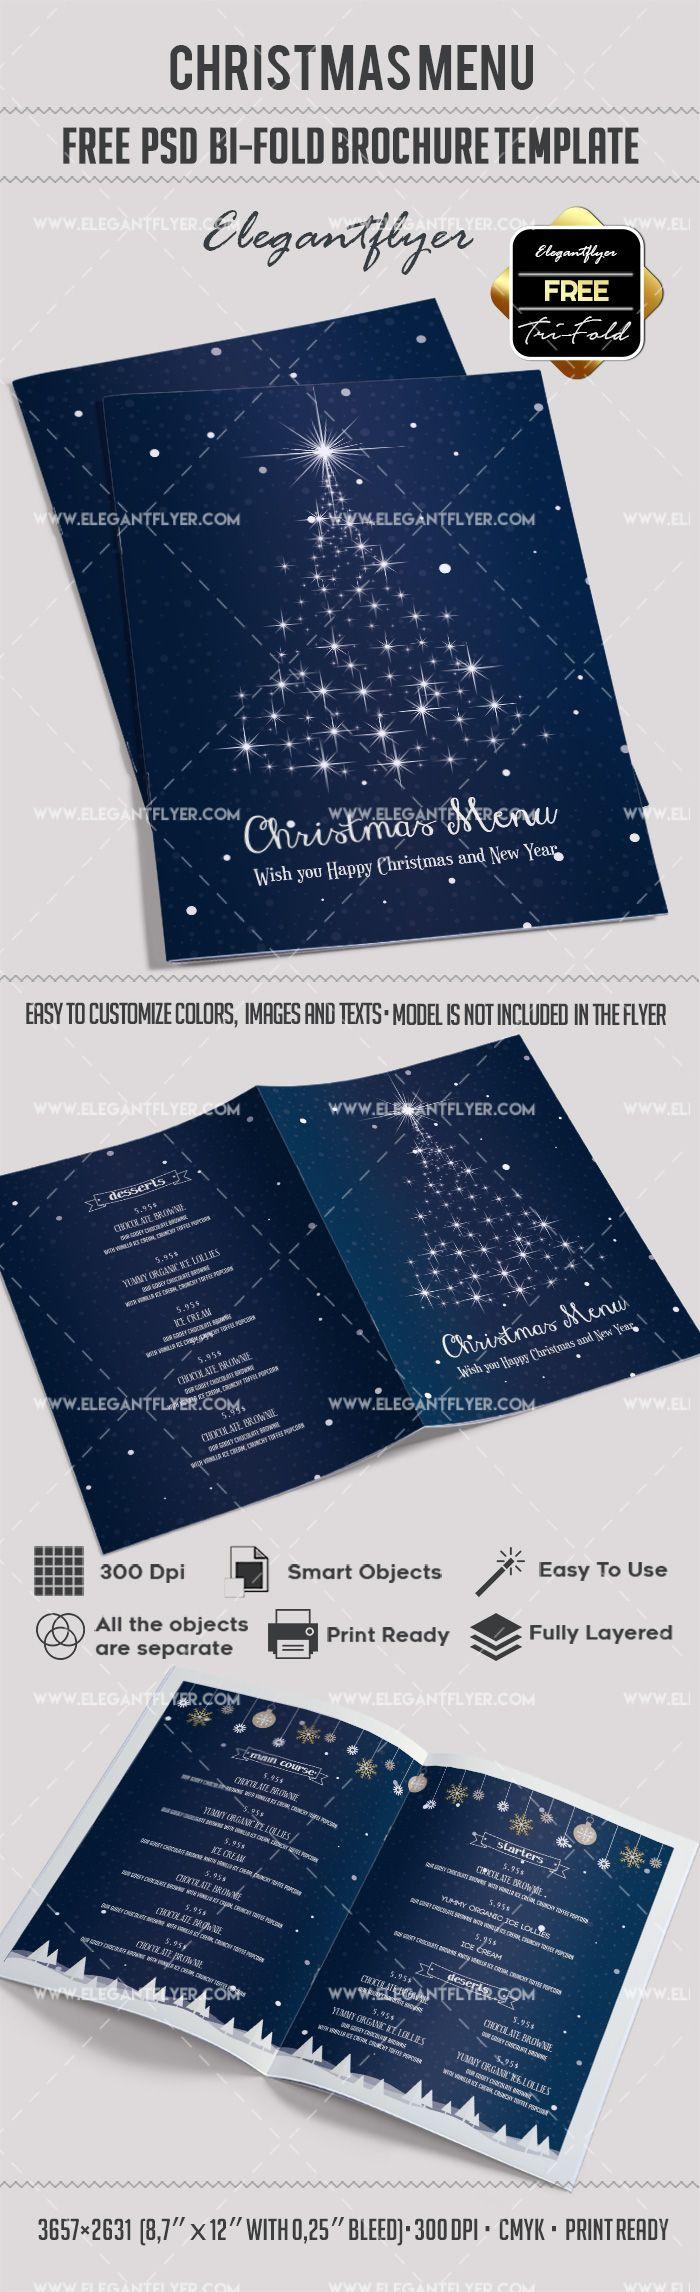 Free Christmas Menu – Bi-Fold PSD Brochure Template | Pinterest ...